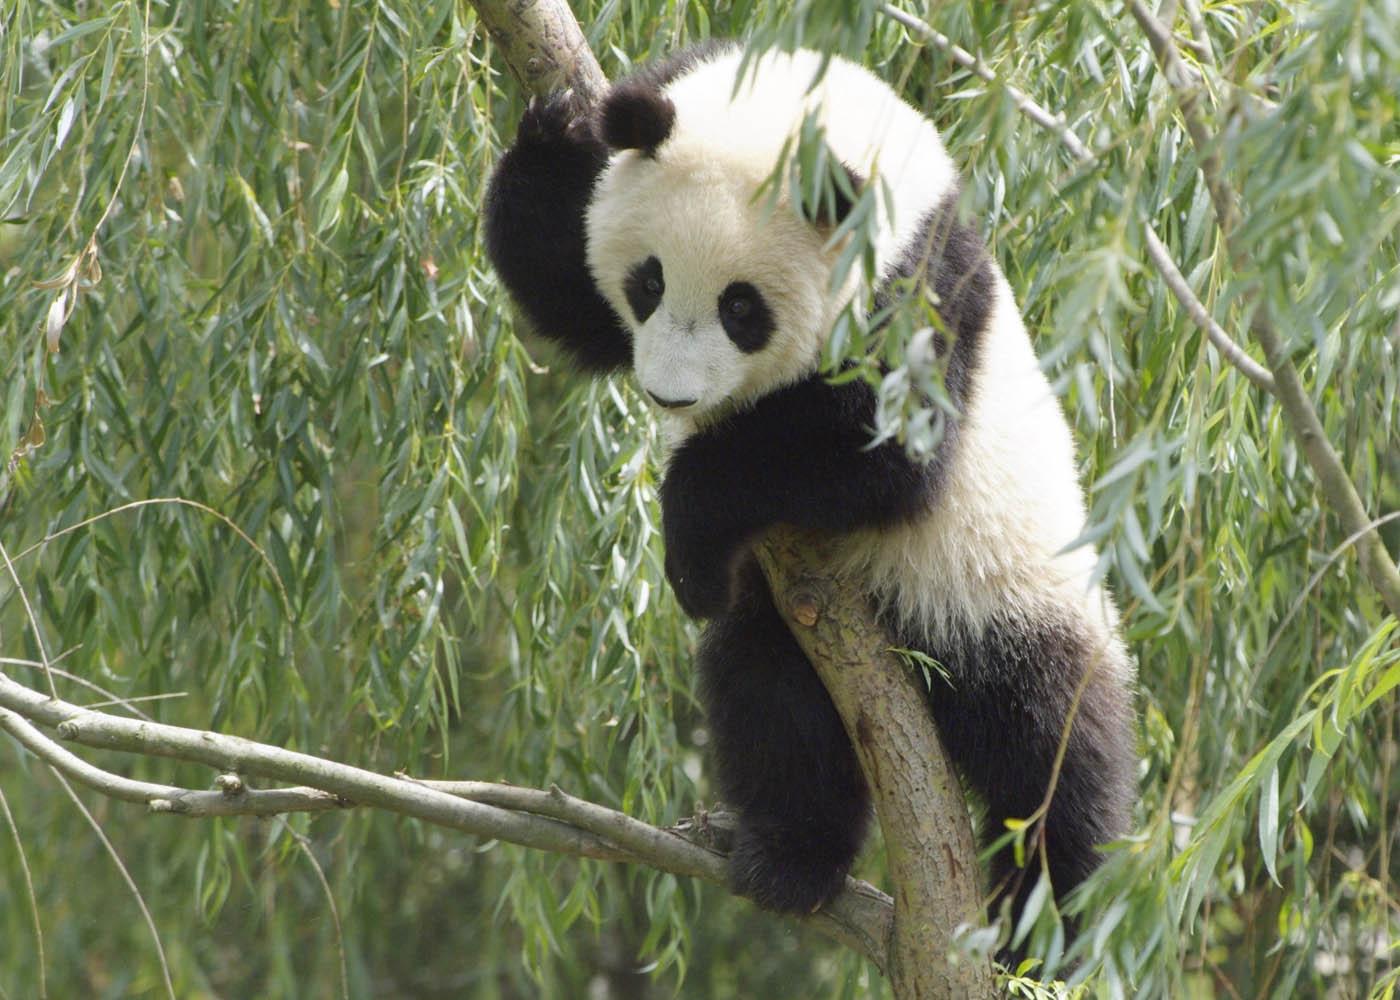 wallpapersstillmazacom201108cute panda desktop wallpaper free 1400x1000